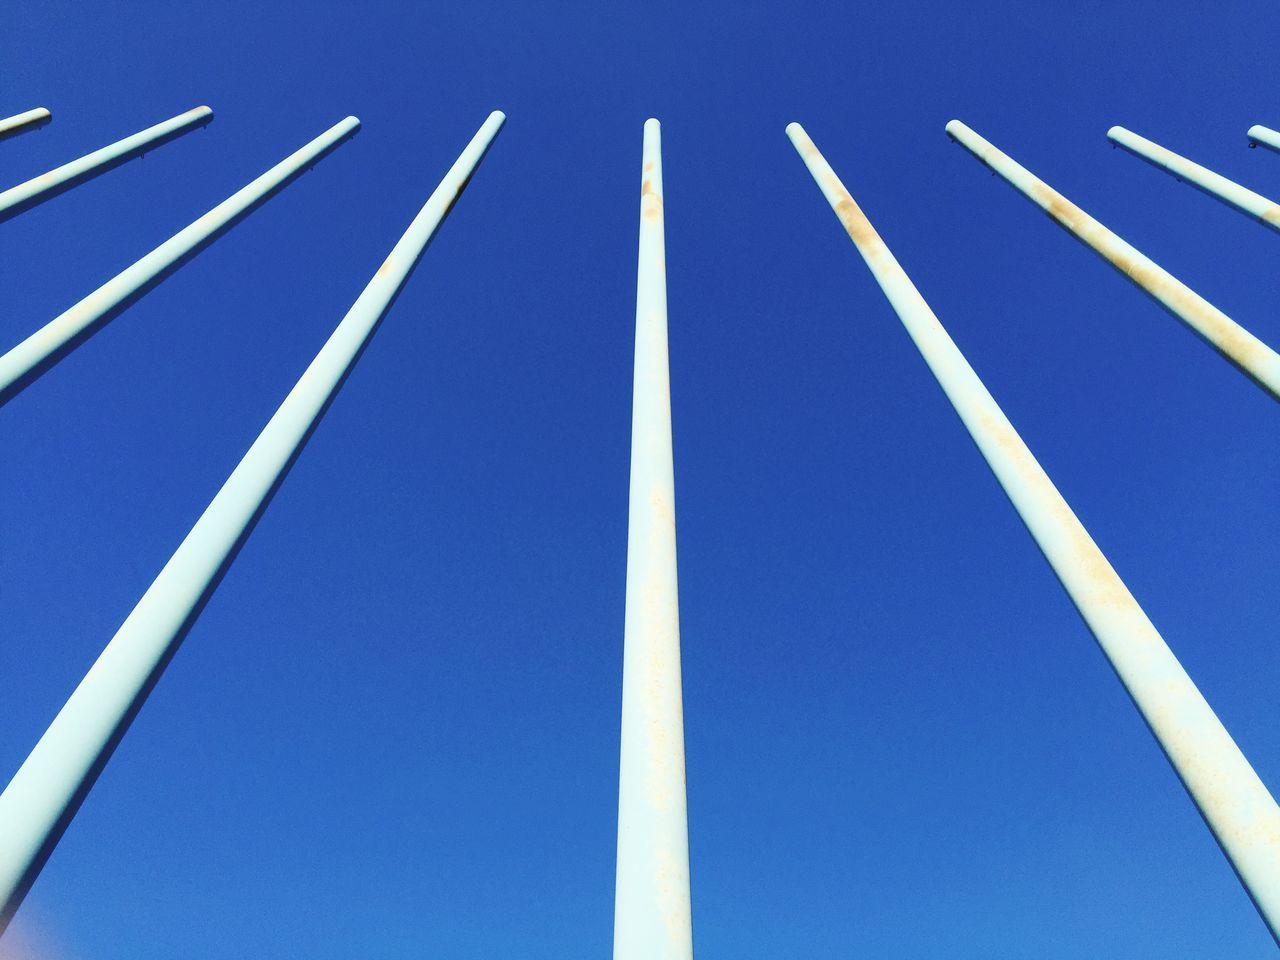 Cobalt Blue By Motorola Smart Simplicity Lines Endlessness Blue Sky OpenEdit